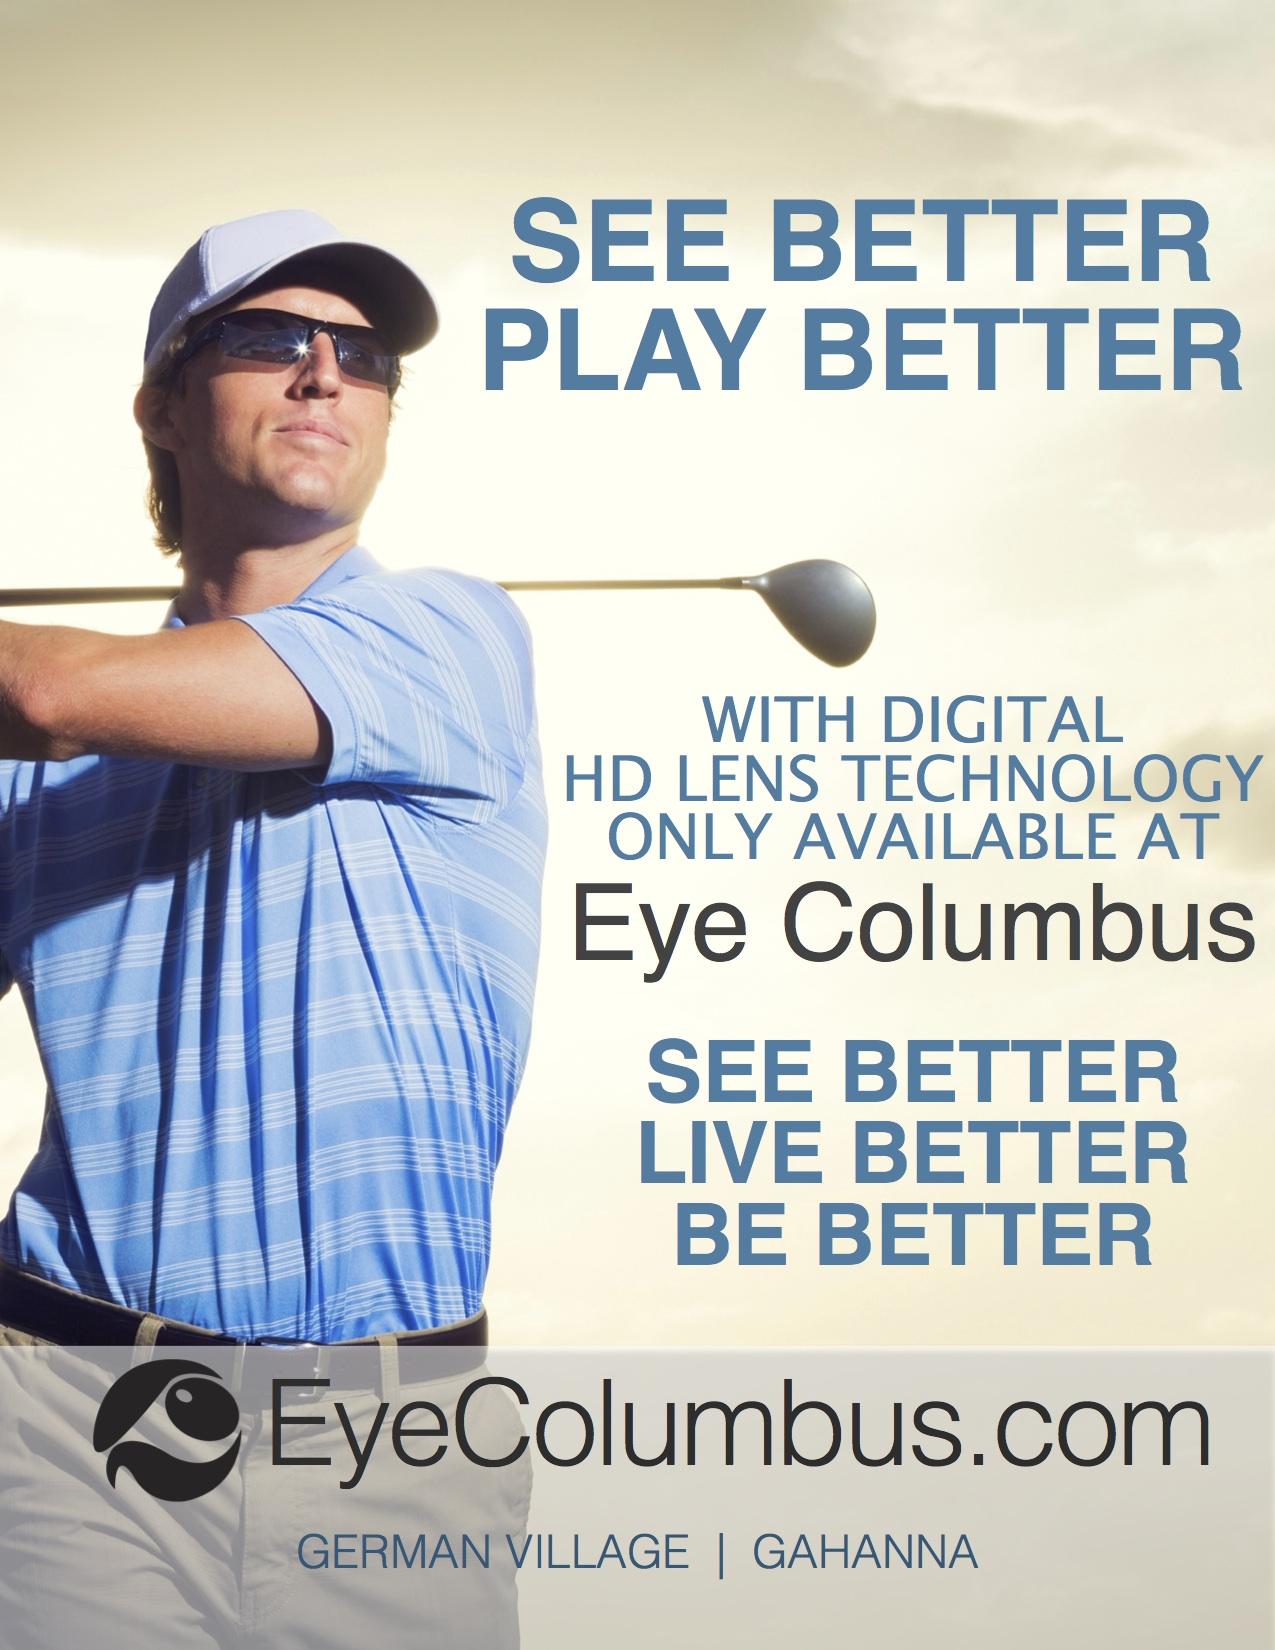 special-golf-glasses.jpg